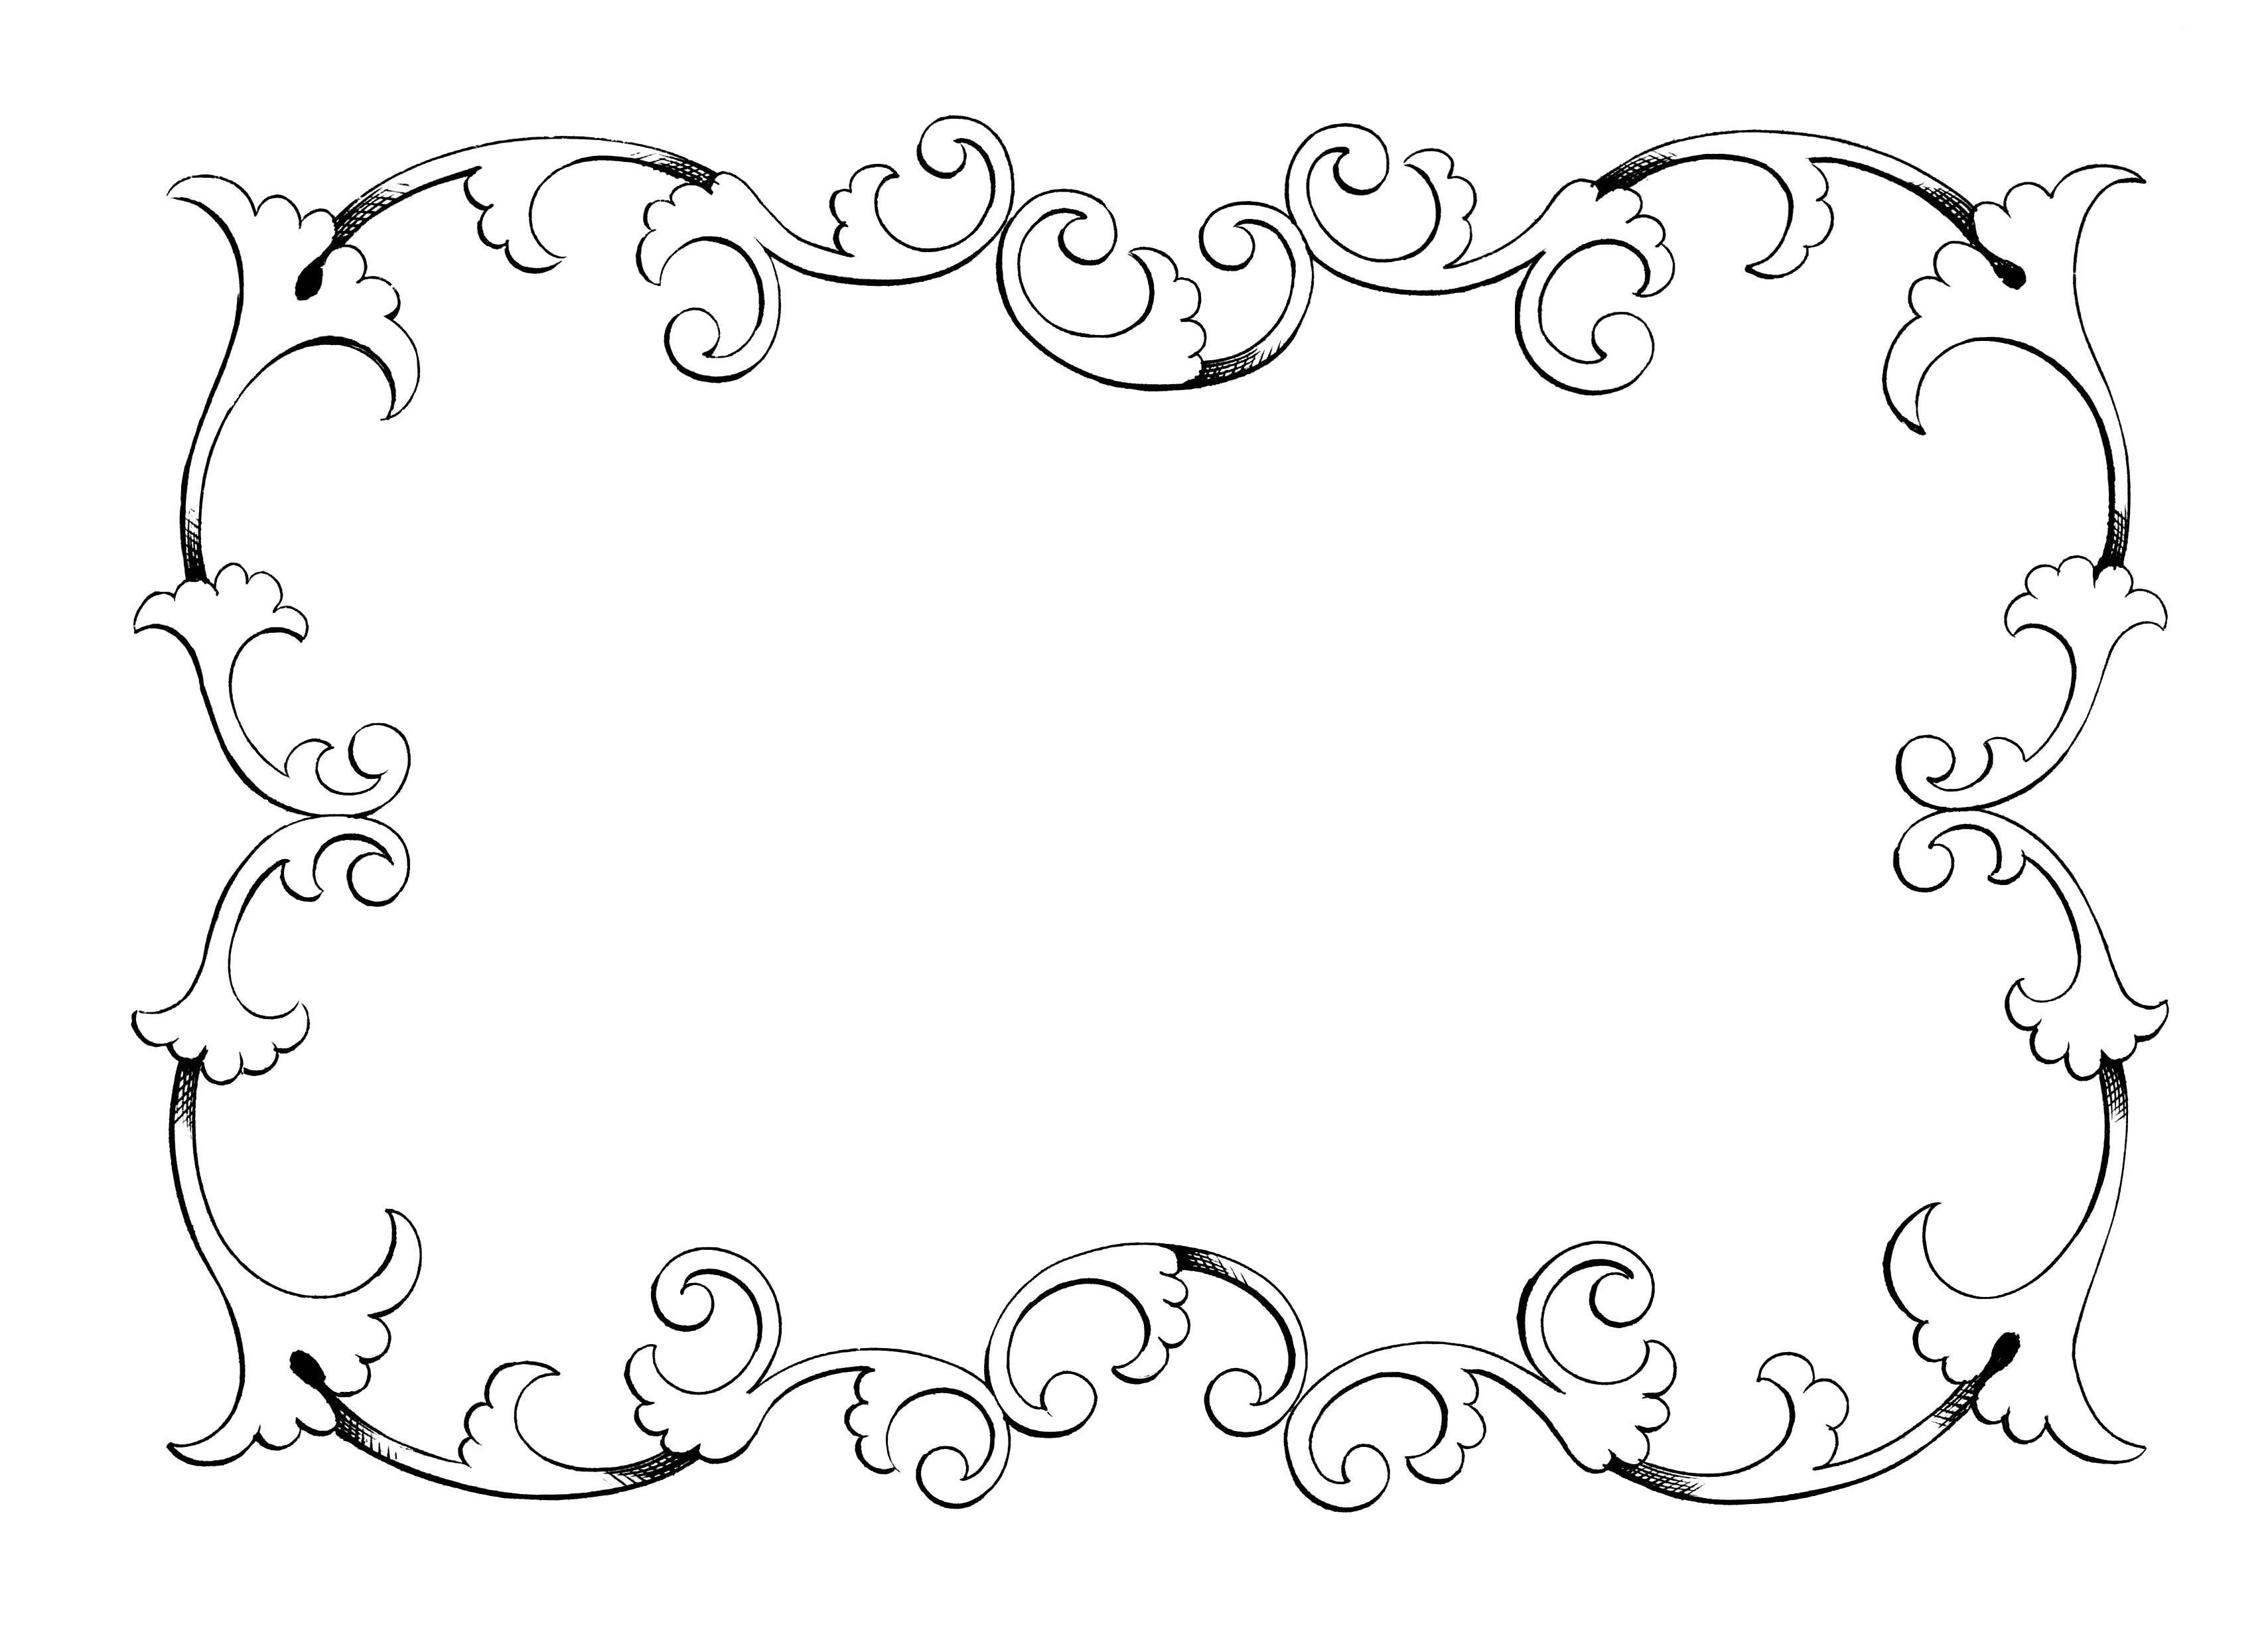 Clipart frames free caicdvrlistscom 3.